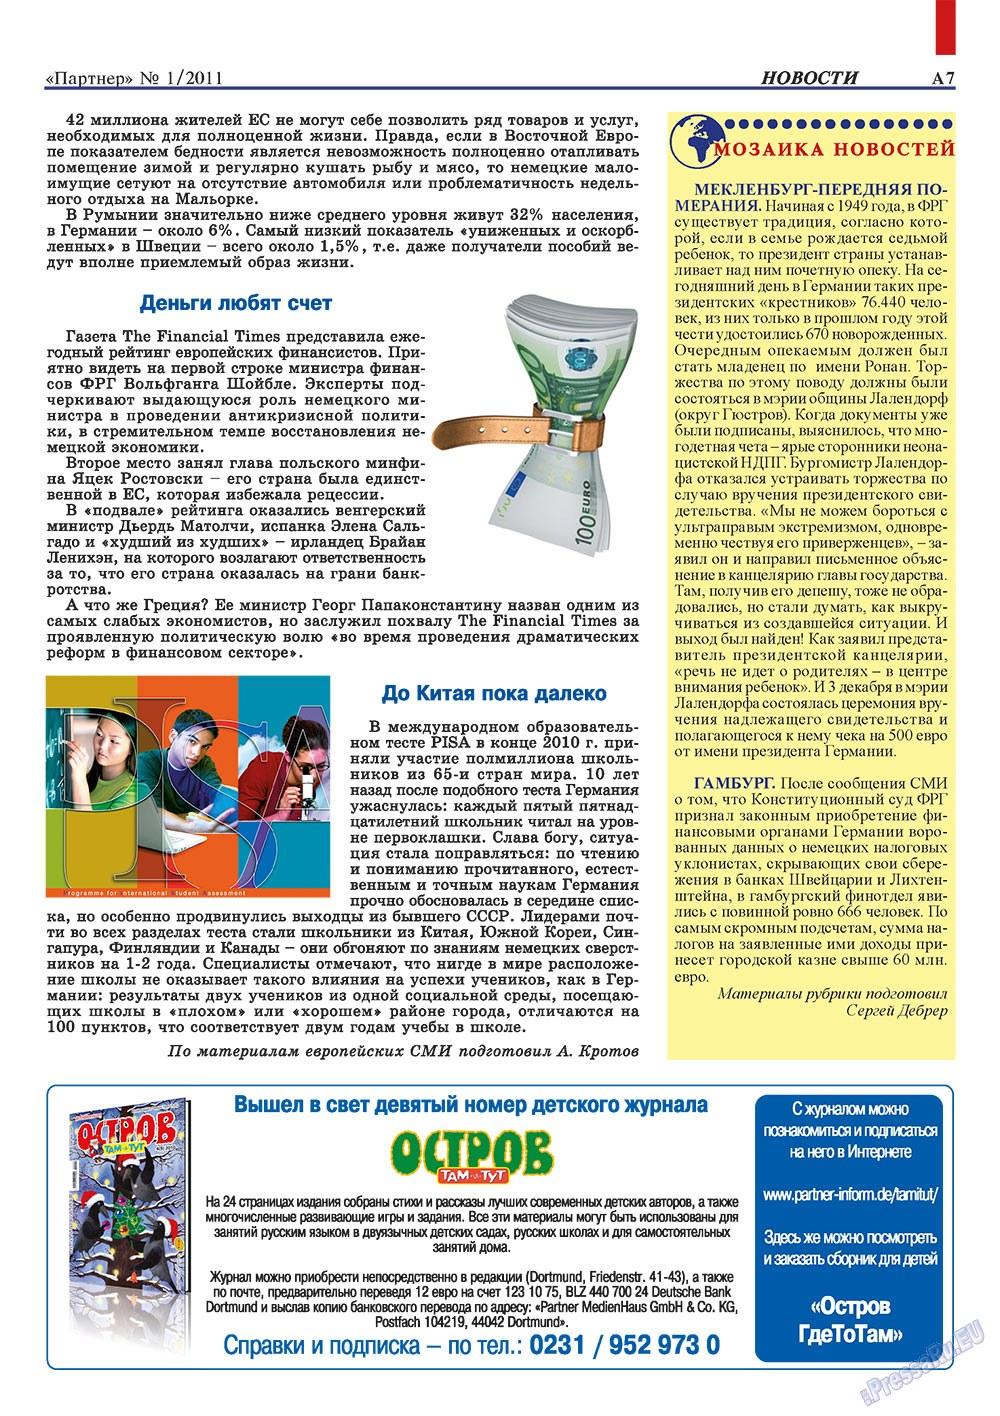 Партнер-север (журнал). 2011 год, номер 1, стр. 7